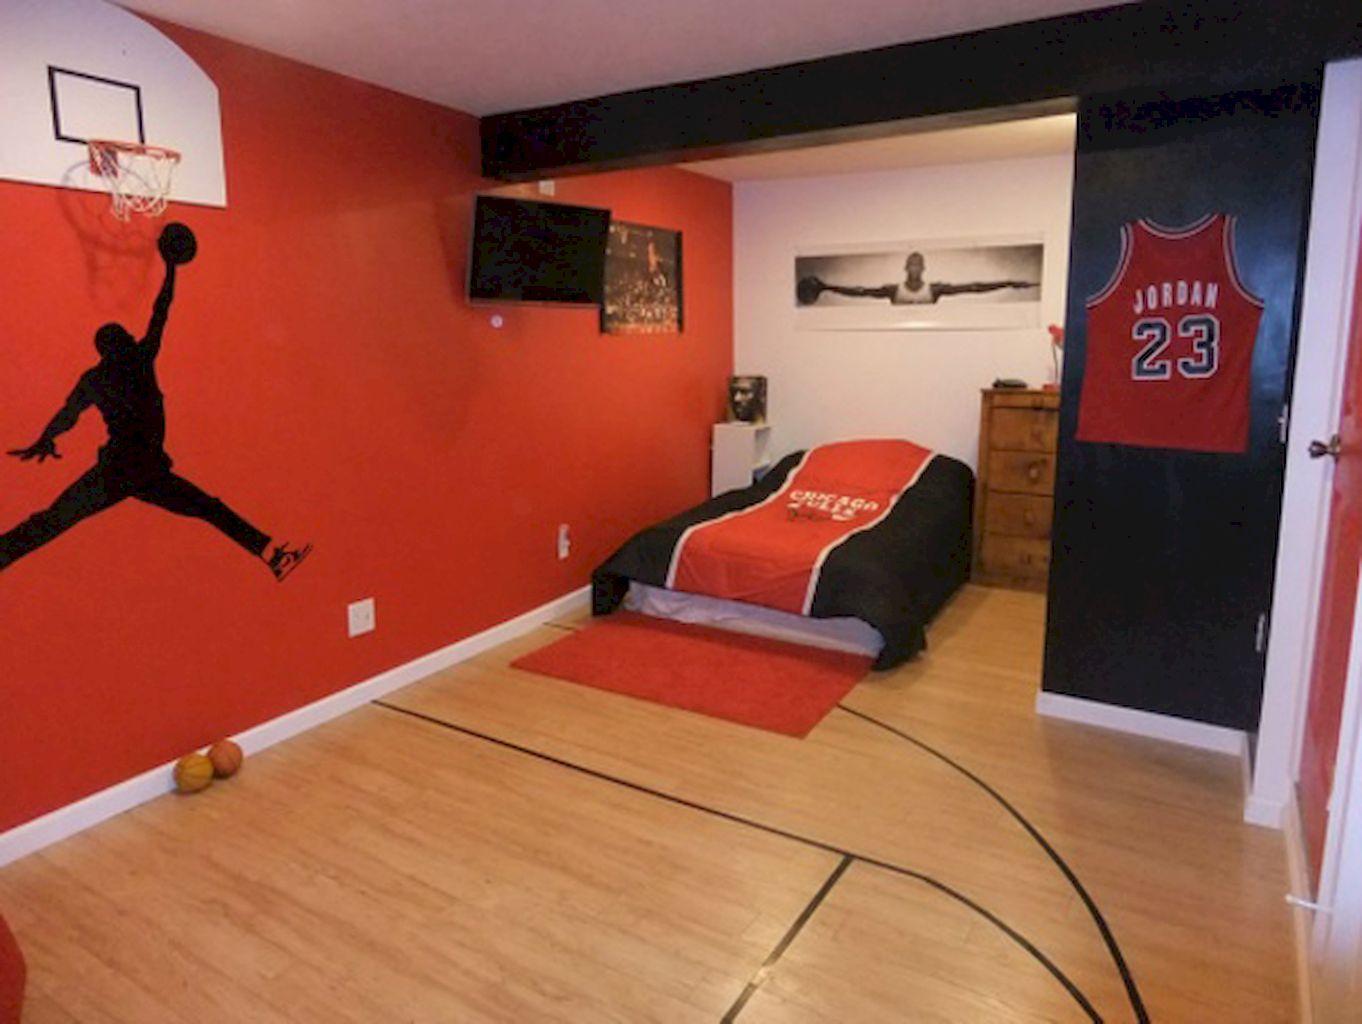 Amazing Awesome 50 Sport Bedroom Design Ideas Remodel For Boys  Https://livingmarch.com/50 Sport Bedroom Ideas Boys/